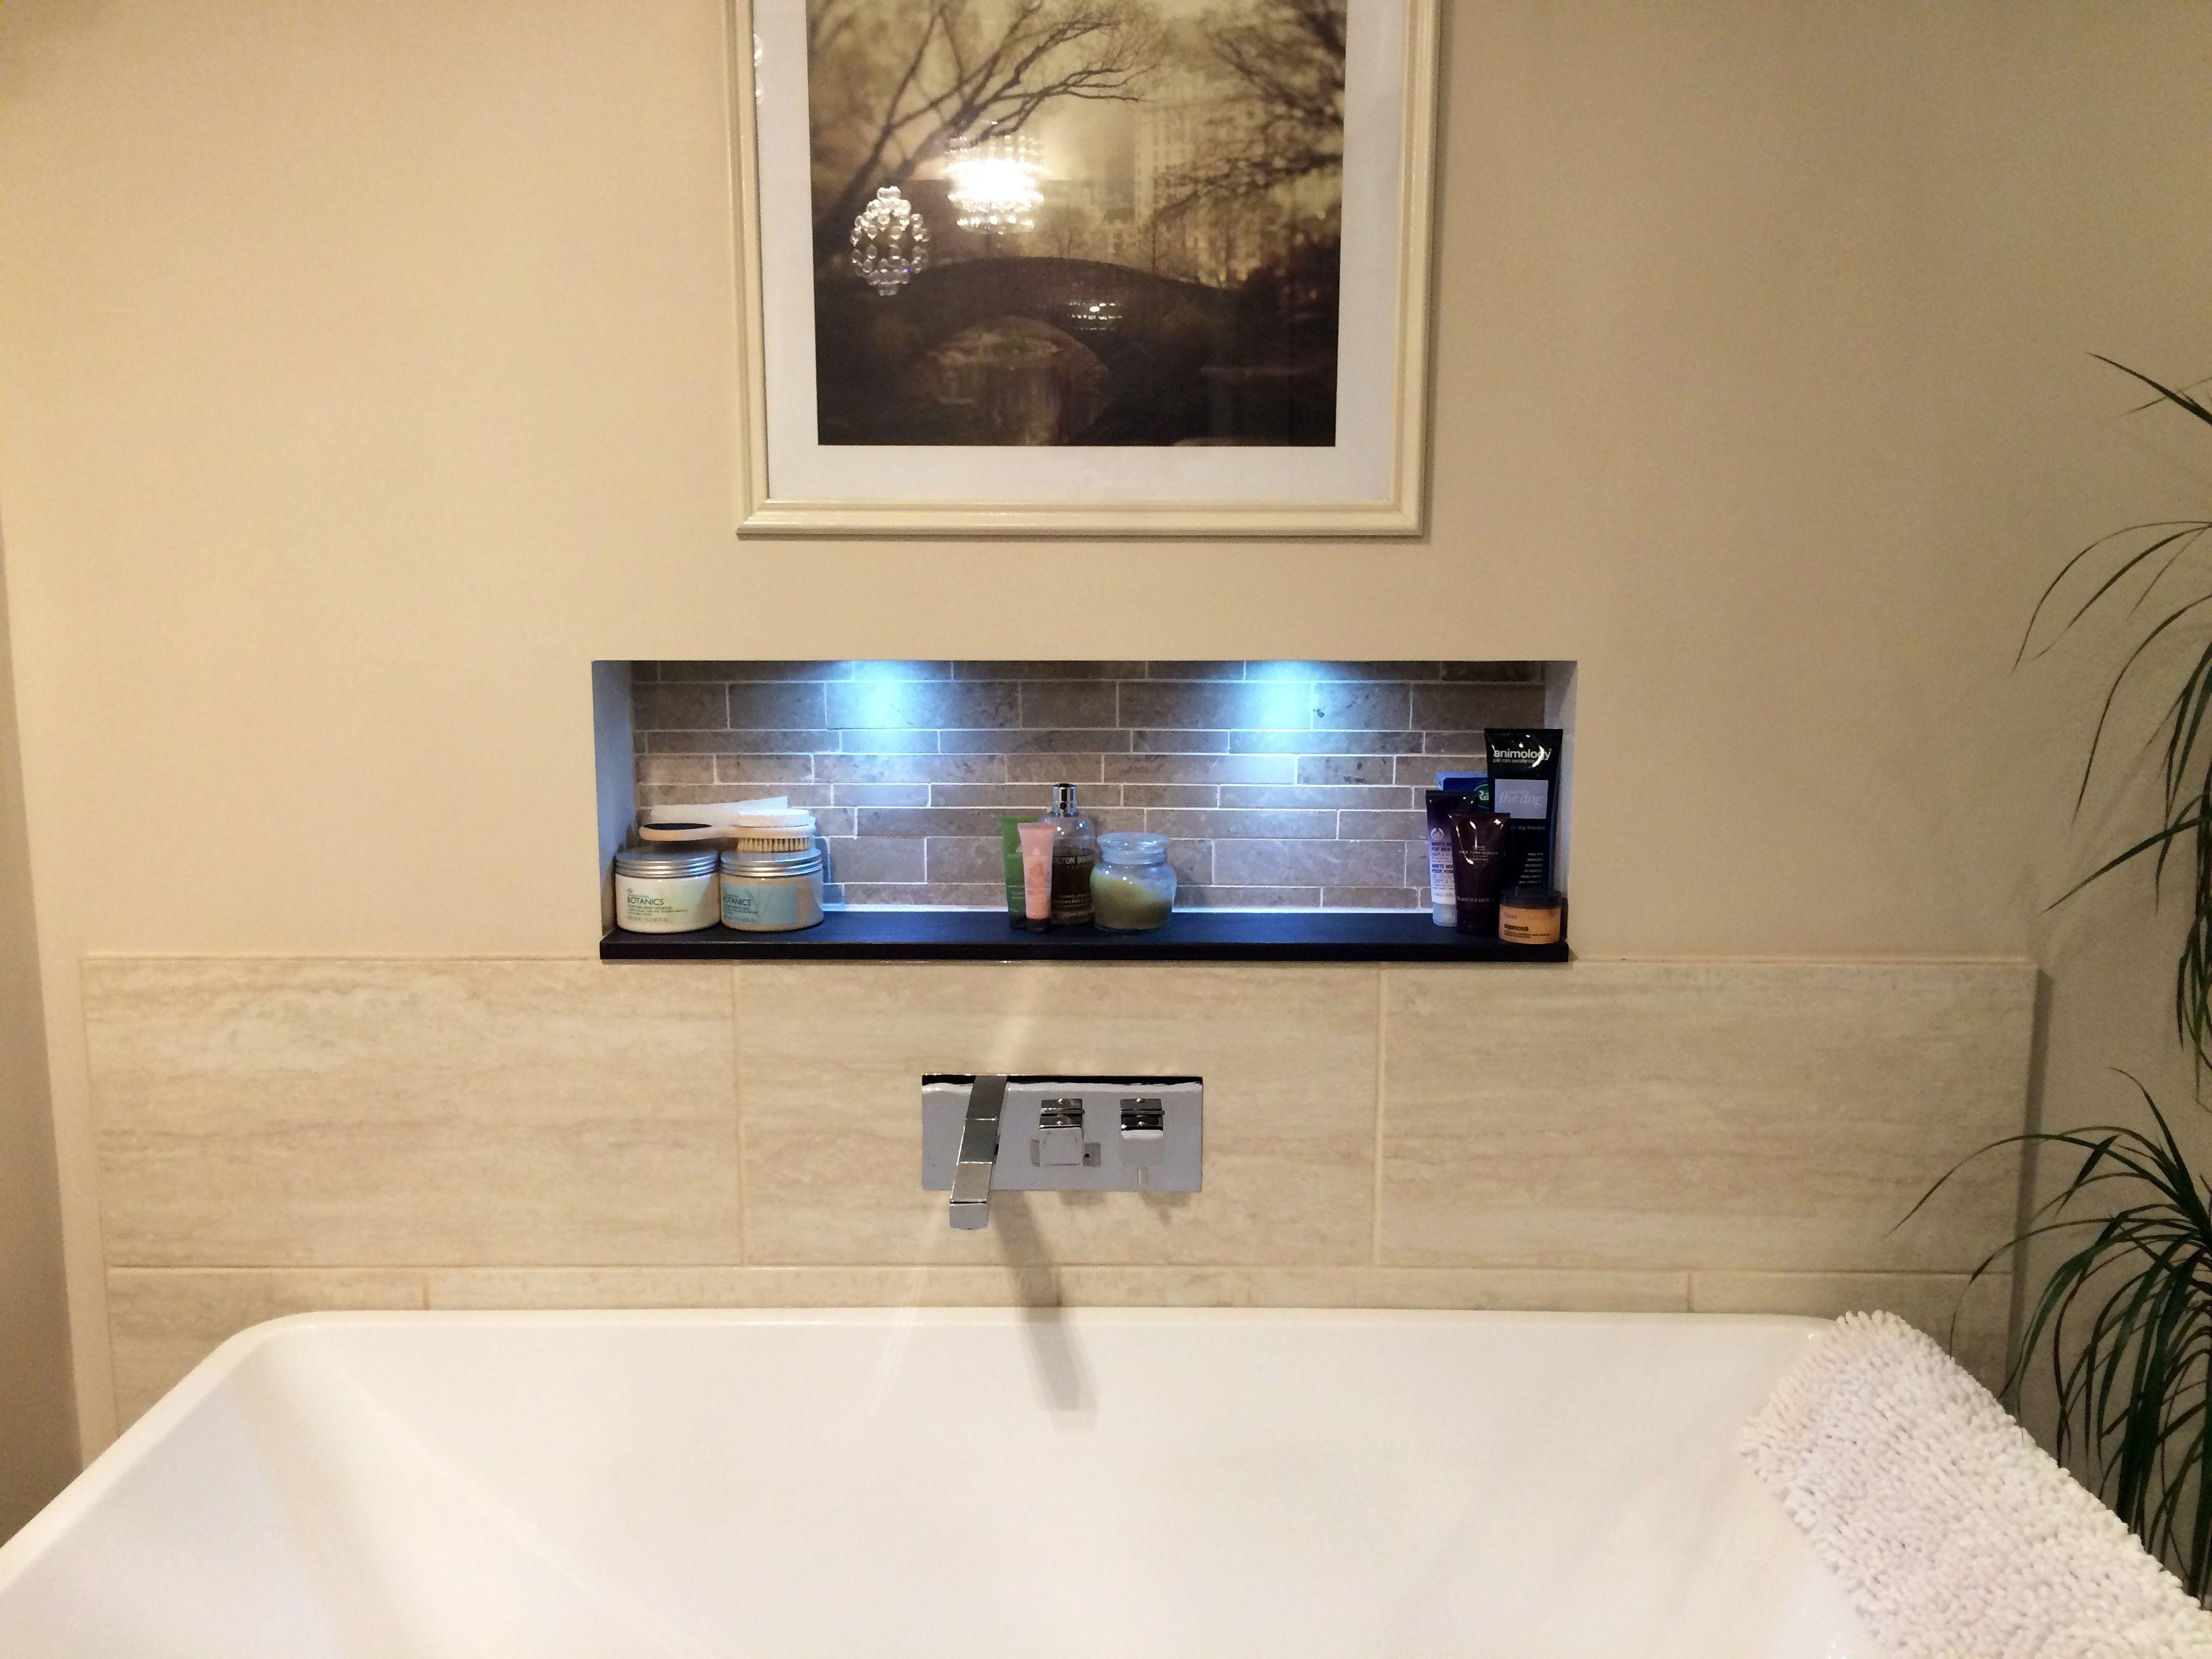 1946 yellow and grey tile bathroom - Deep Luxury Freestanding Bath Large Format Tiles Waterfall Tap Recessed Bathroom Shelf With